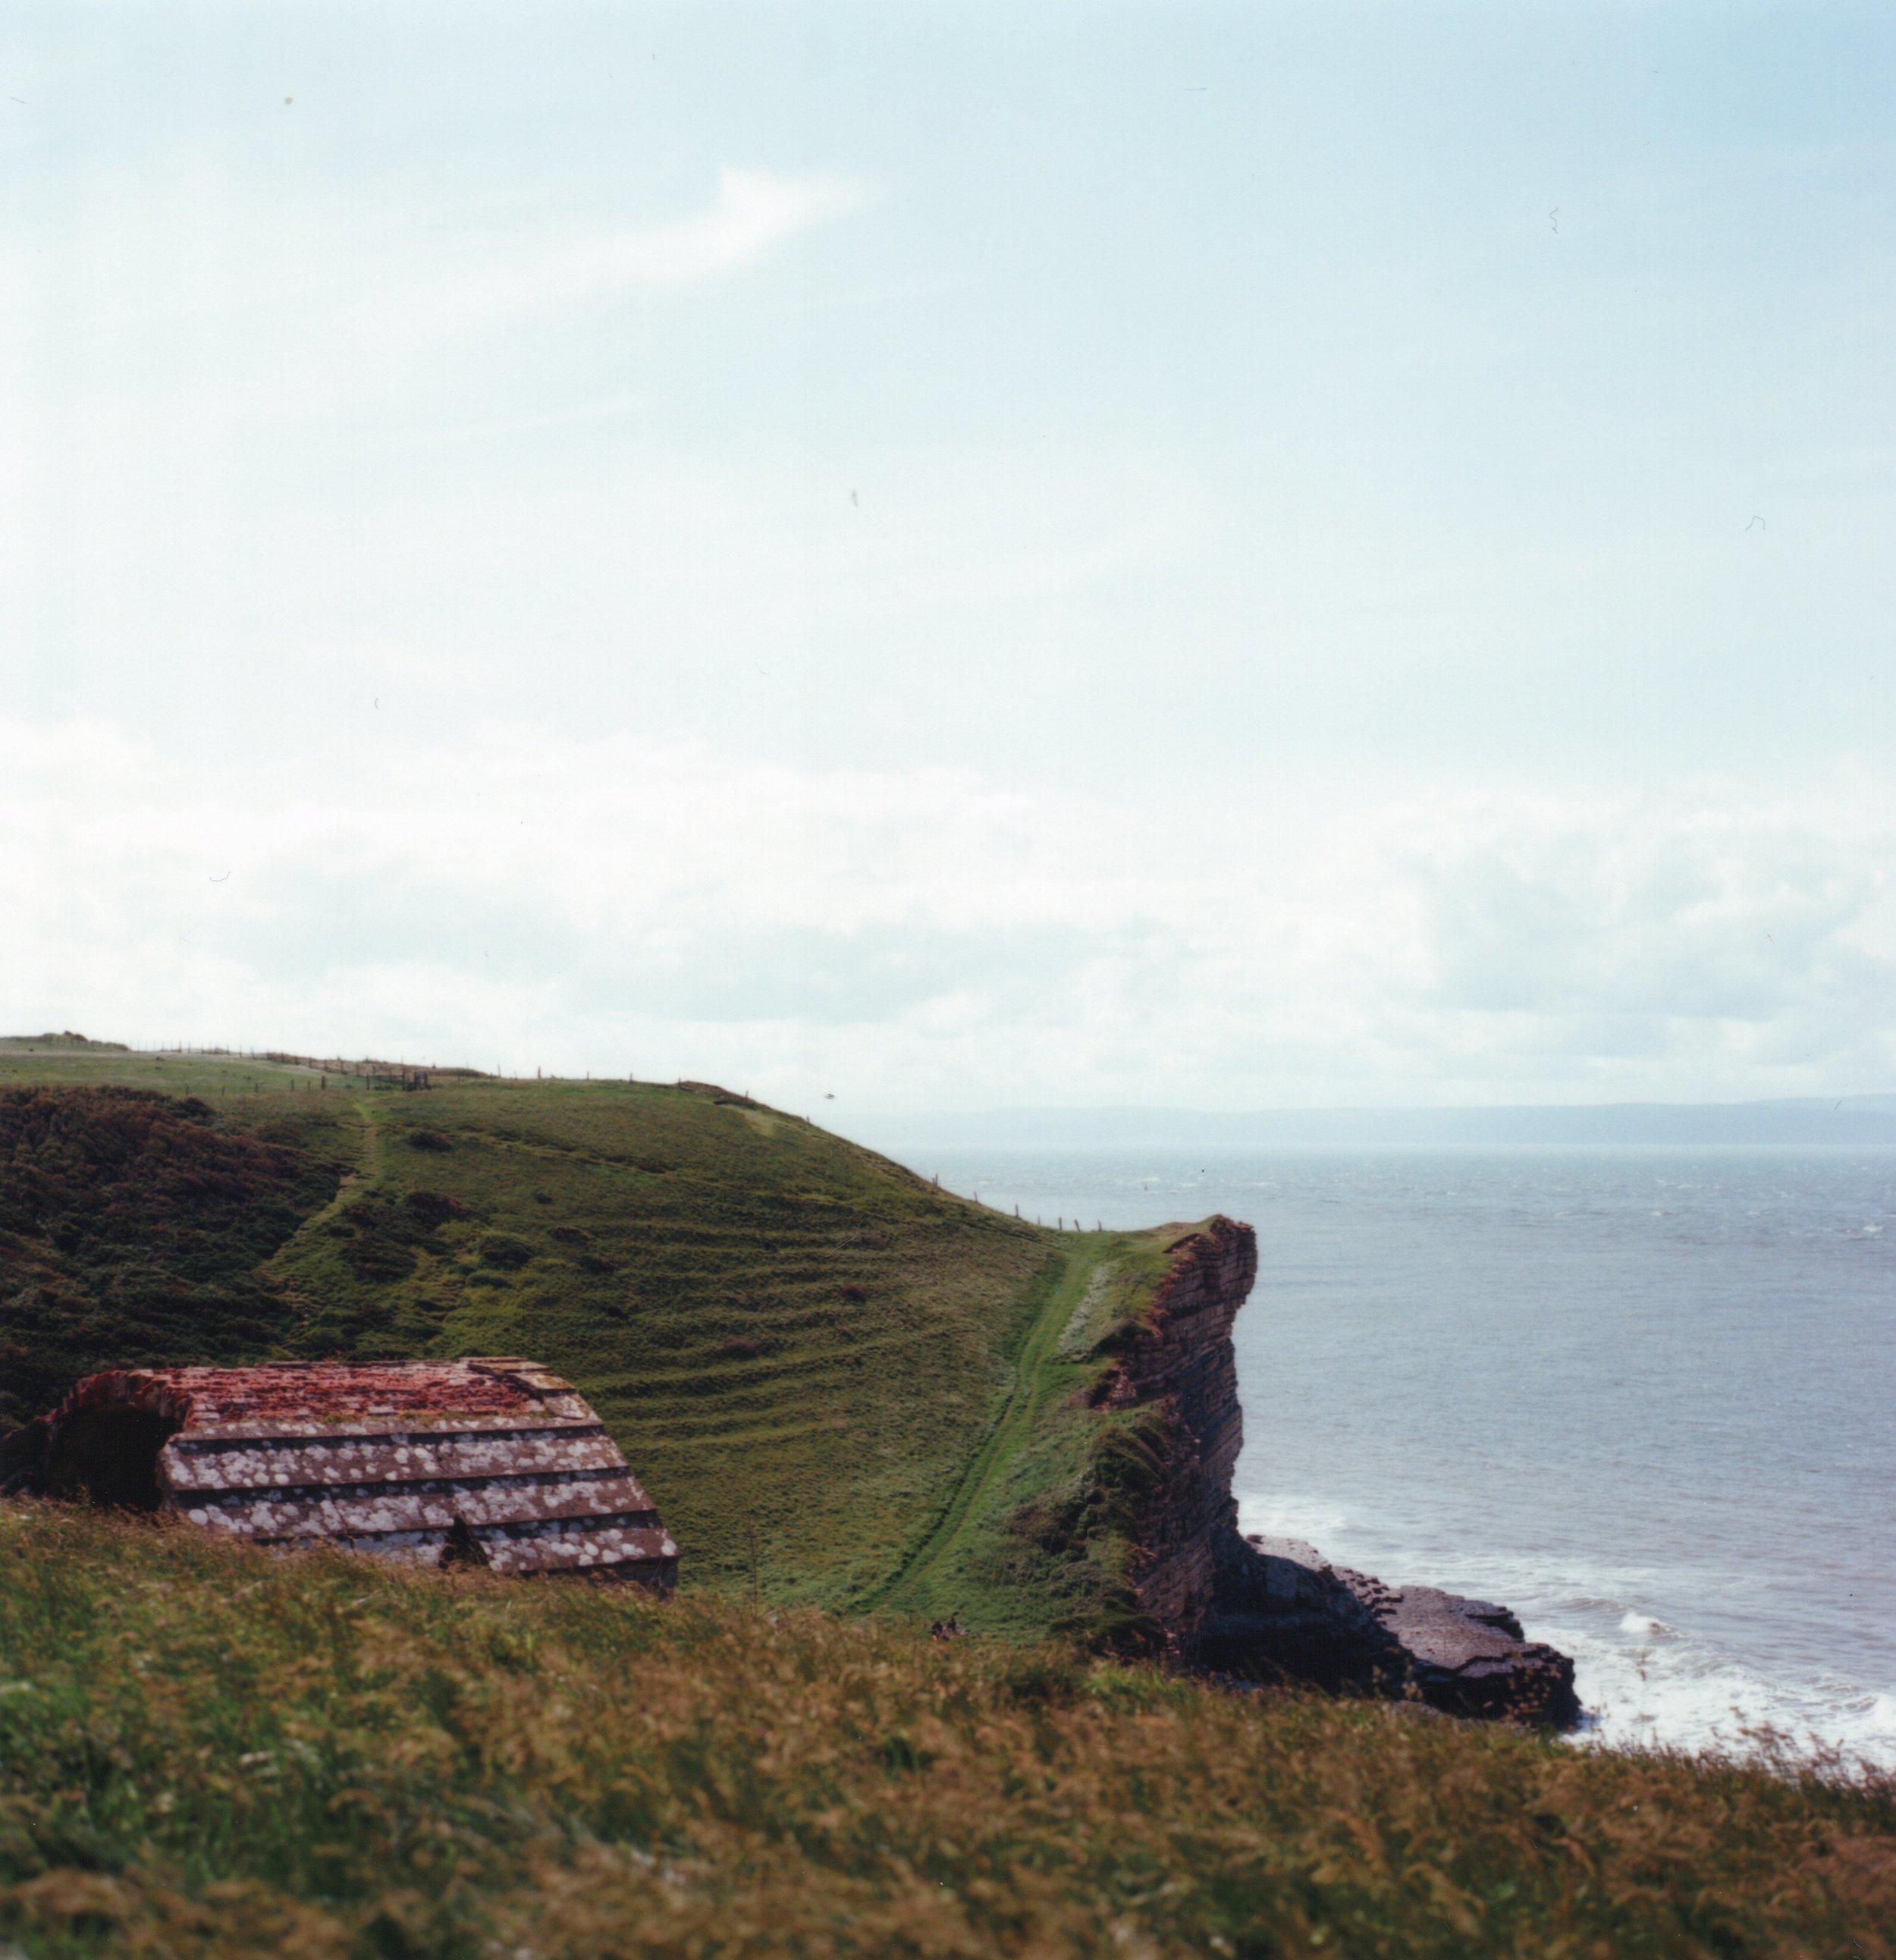 The cliffs at Monknash in the Vale of Glamorgan. Zenza Bronica S2A, Kodak Ektar 100.